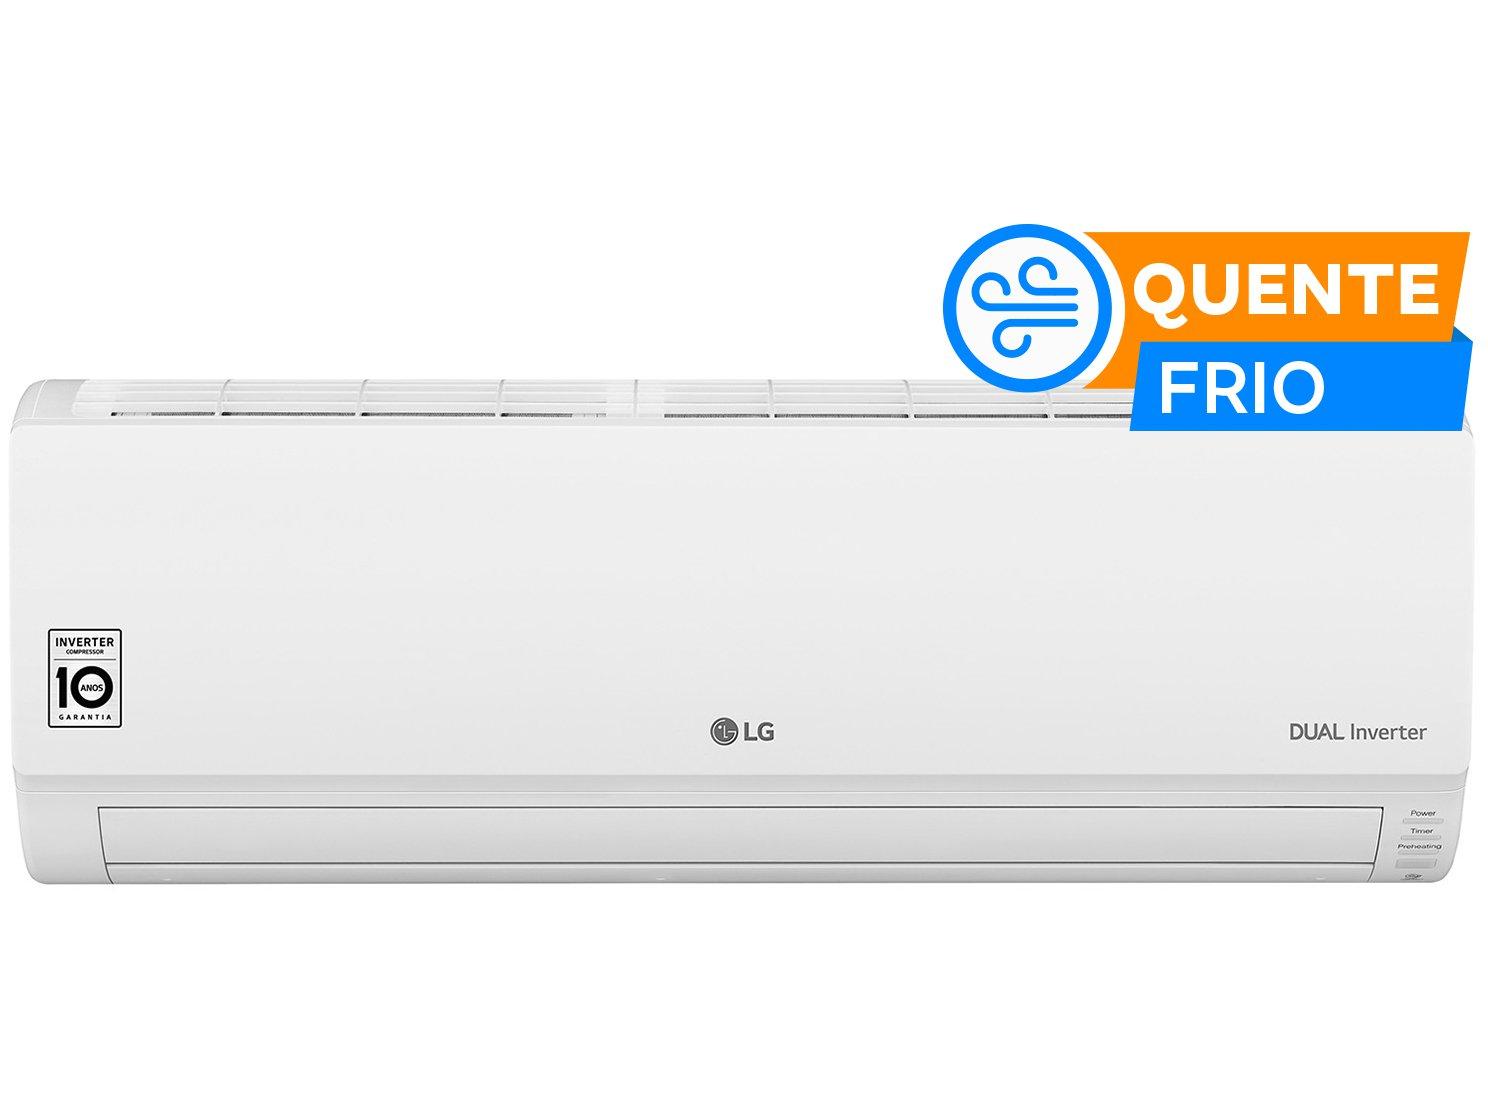 Ar-condicionado Split LG Inverter 9.000 BTUs - Quente/Frio Dual Inverter S4W09WA5WA - 220 V - 1